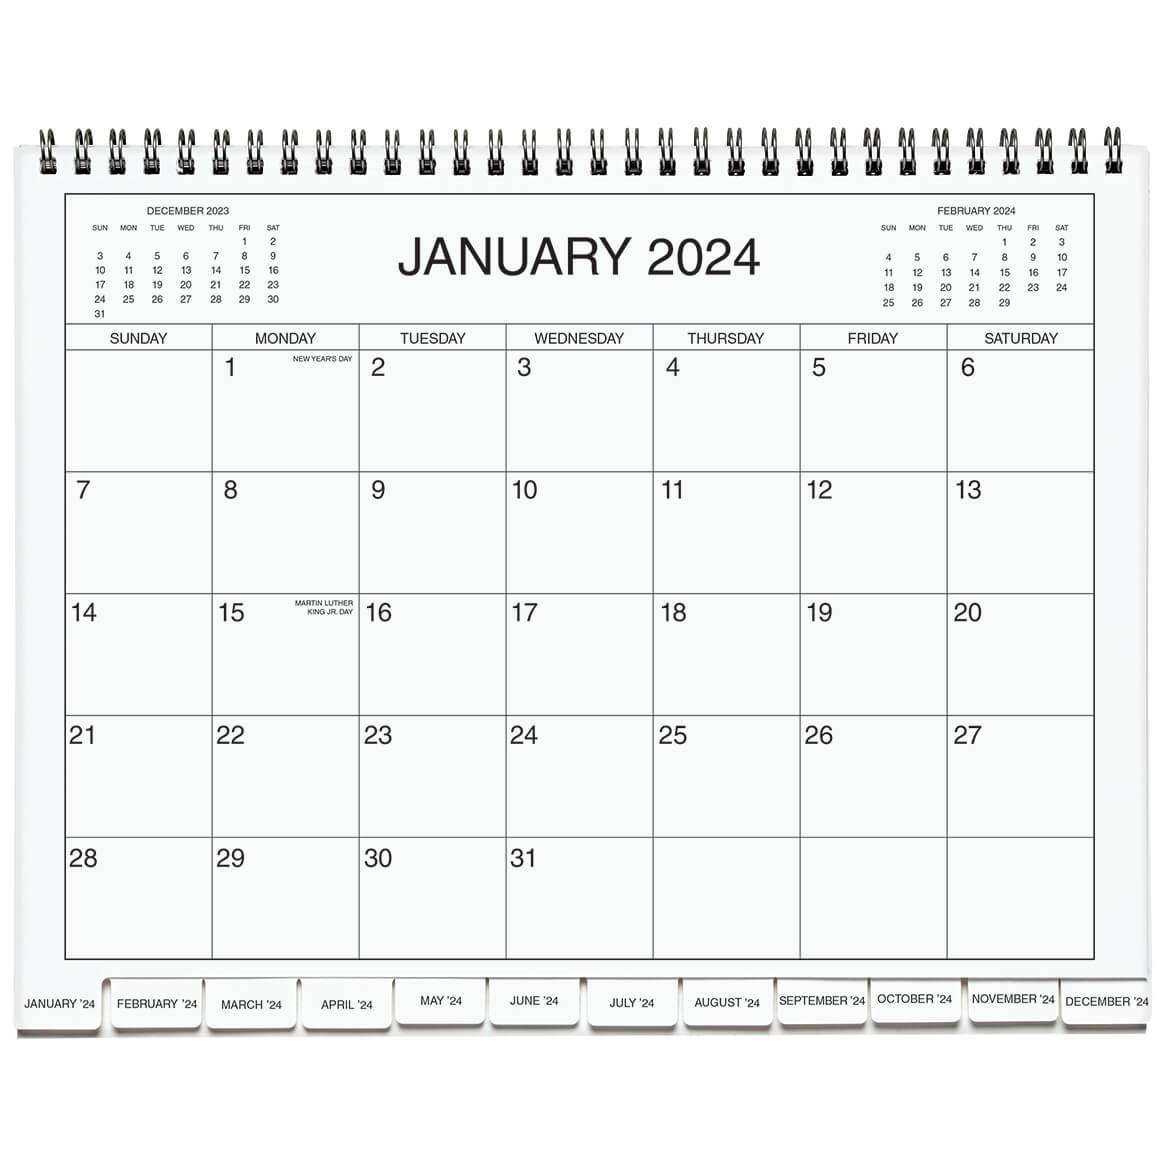 Five Year Calendar Planner 2021 2025 Miles Kimball 1